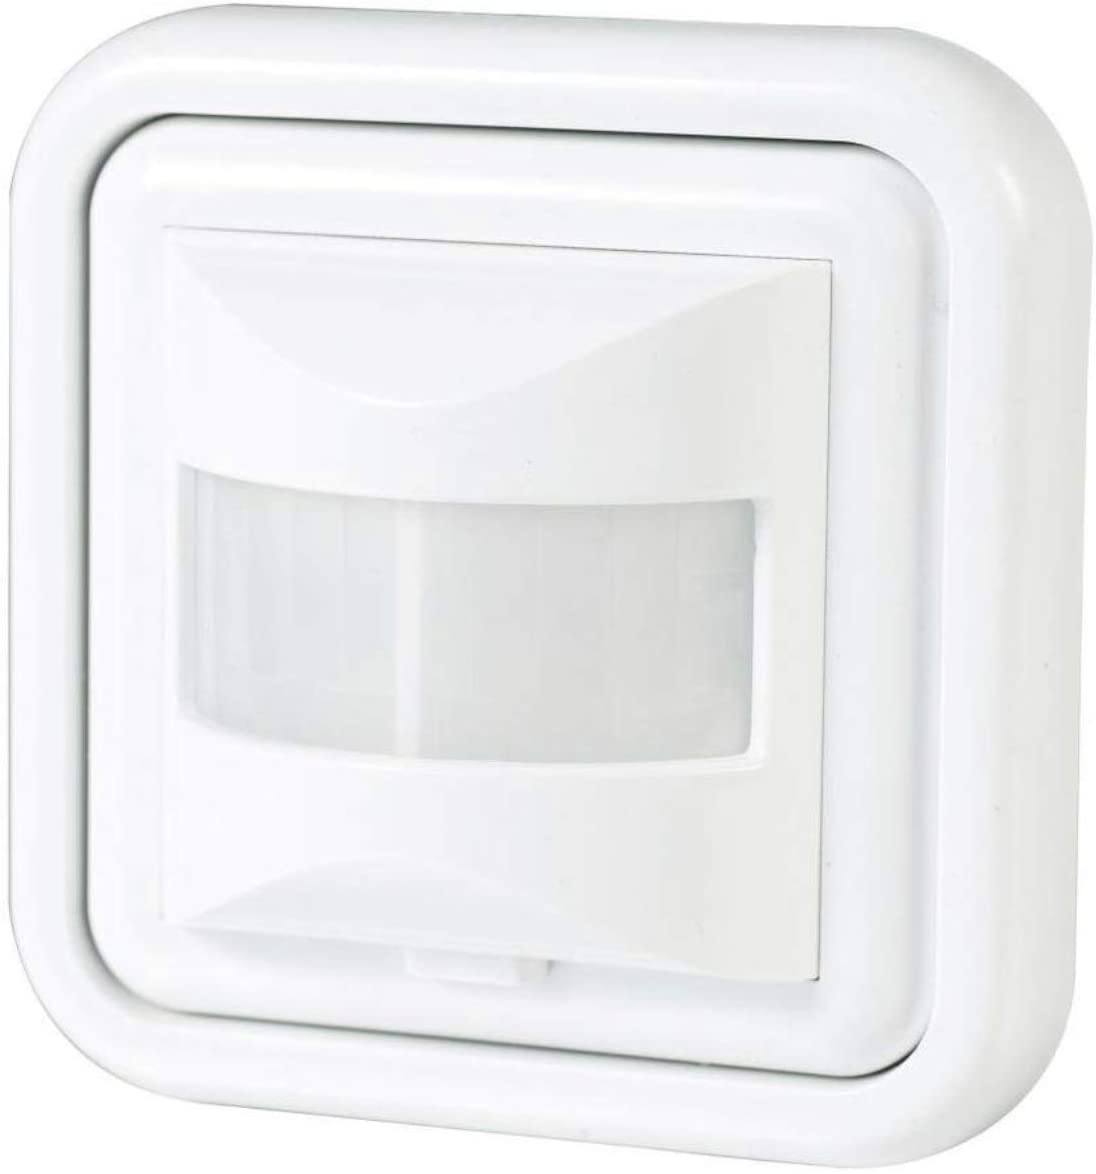 Detector Movimiento Empotrable para Led. Sensor de Presencia. Medidas Standard compatibles Caja Pared.